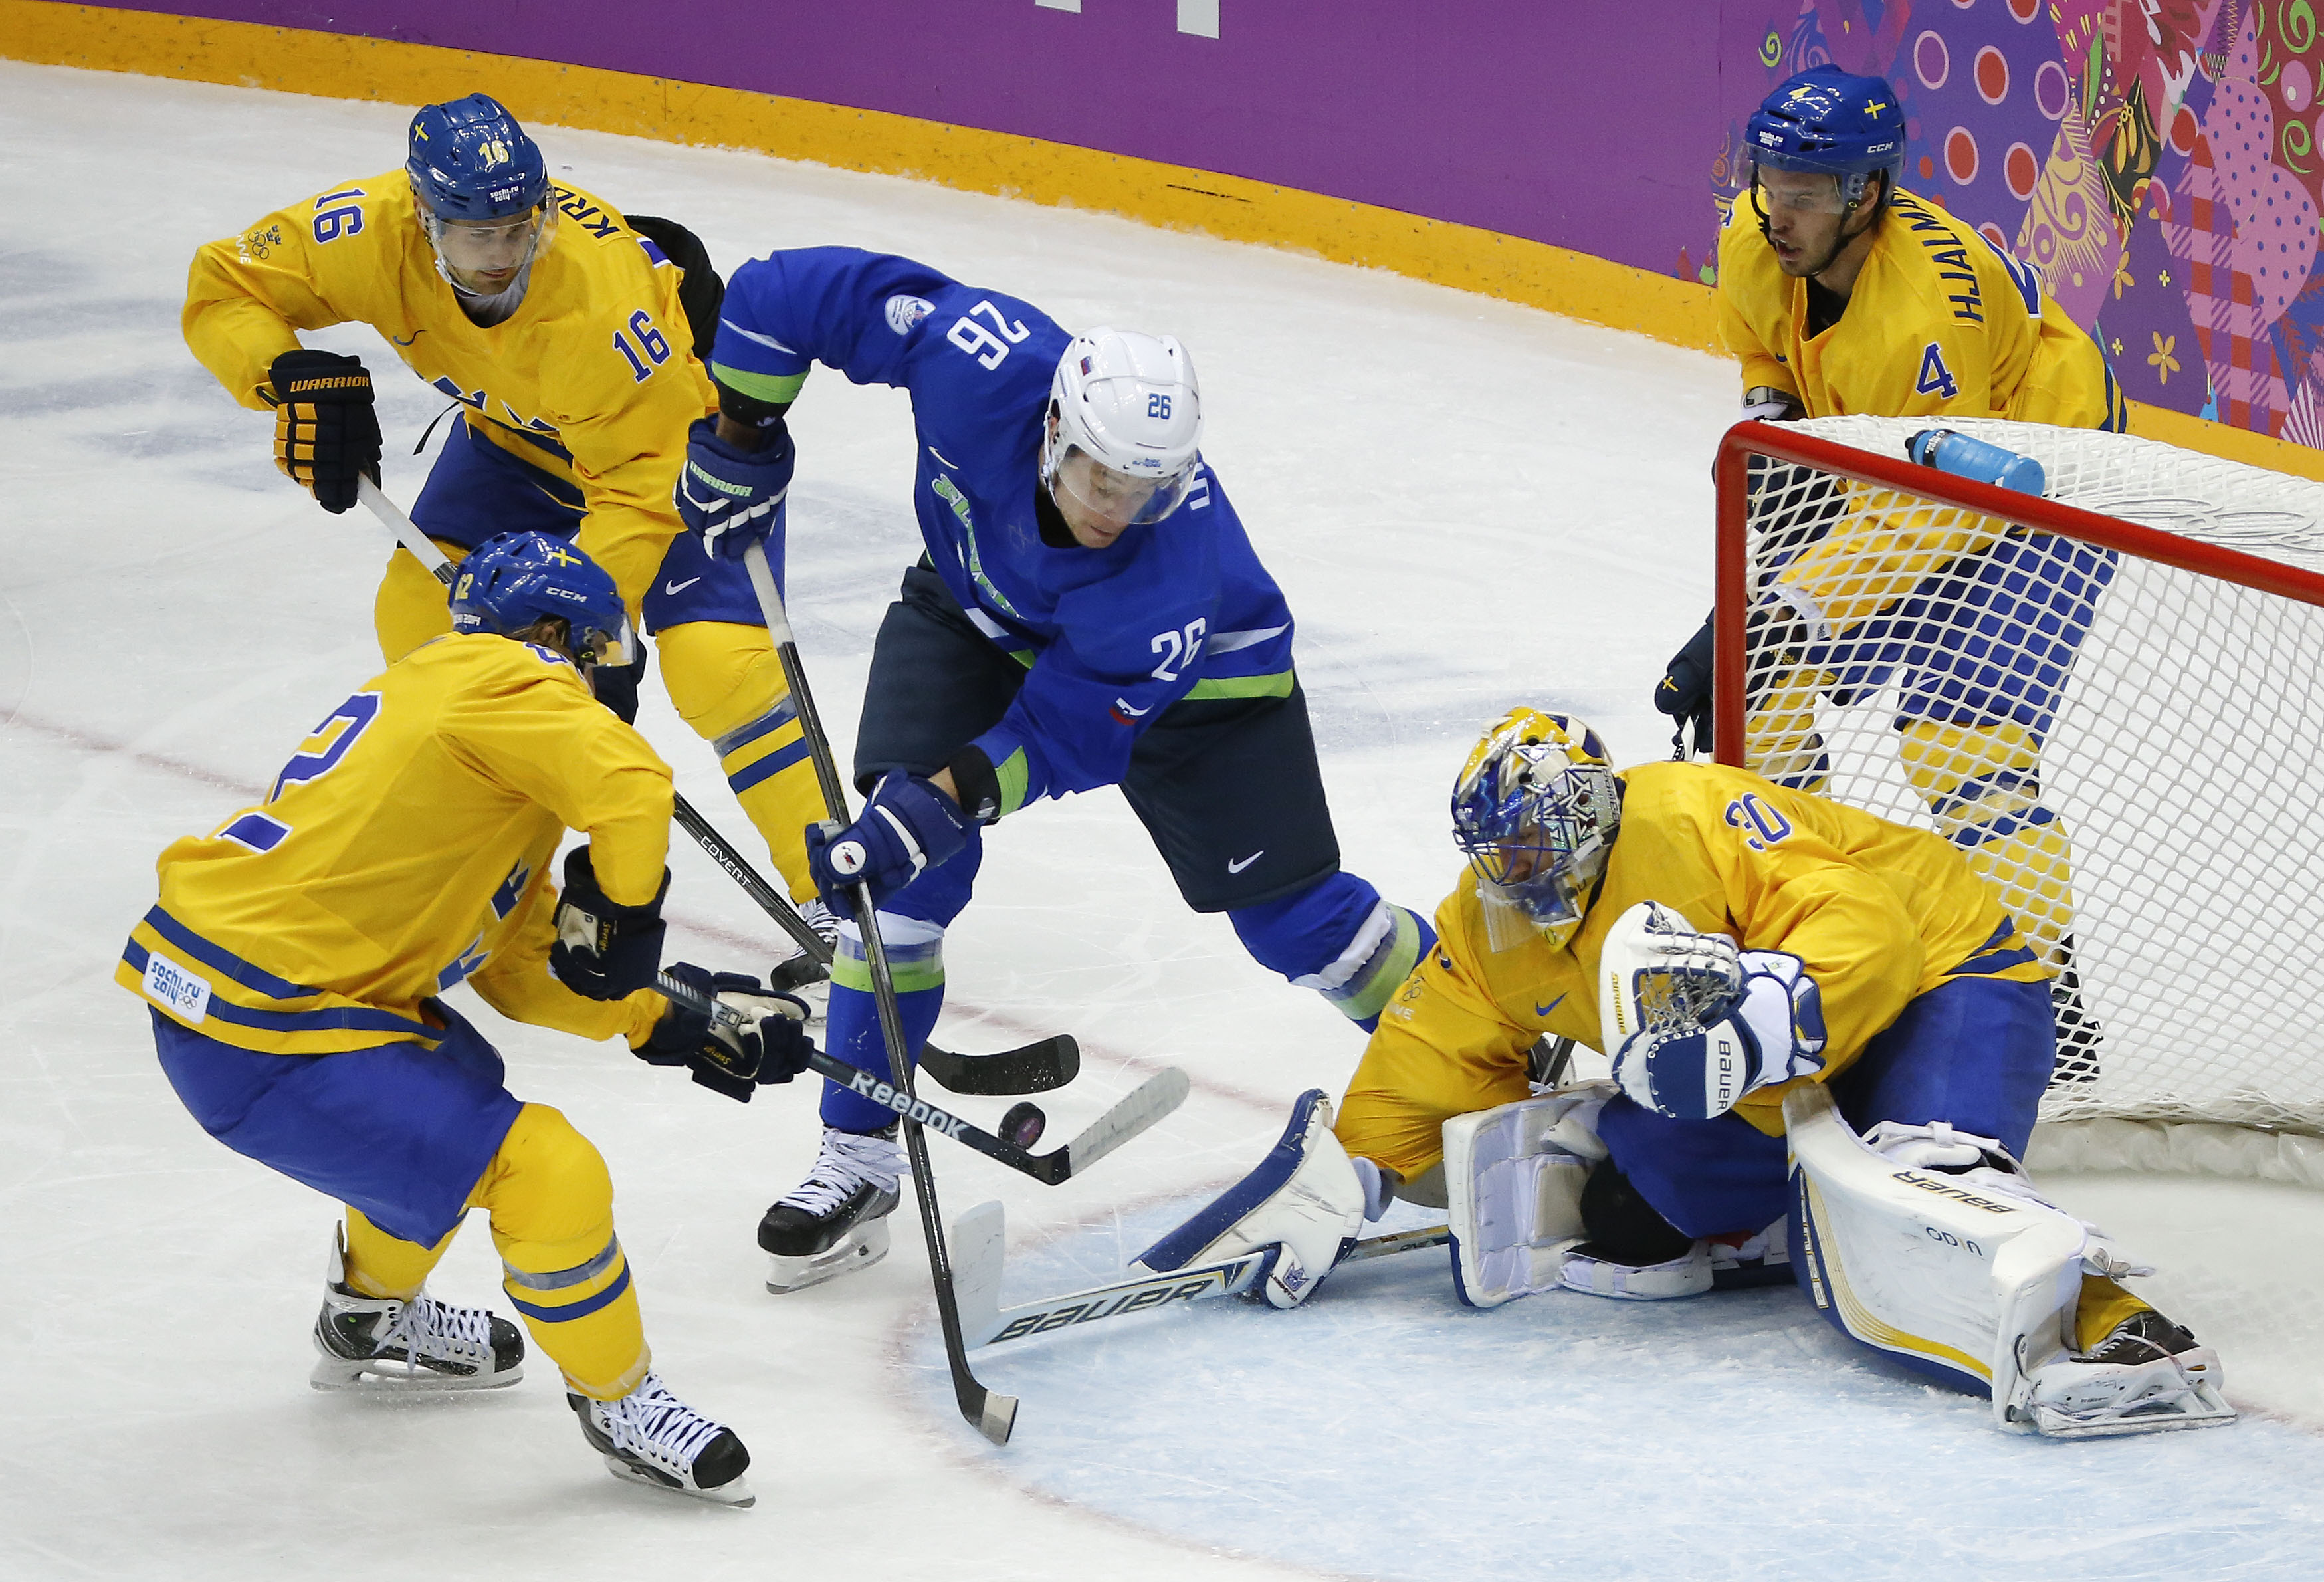 Sweden tops Slovenia 5-0, advances to hockey semis